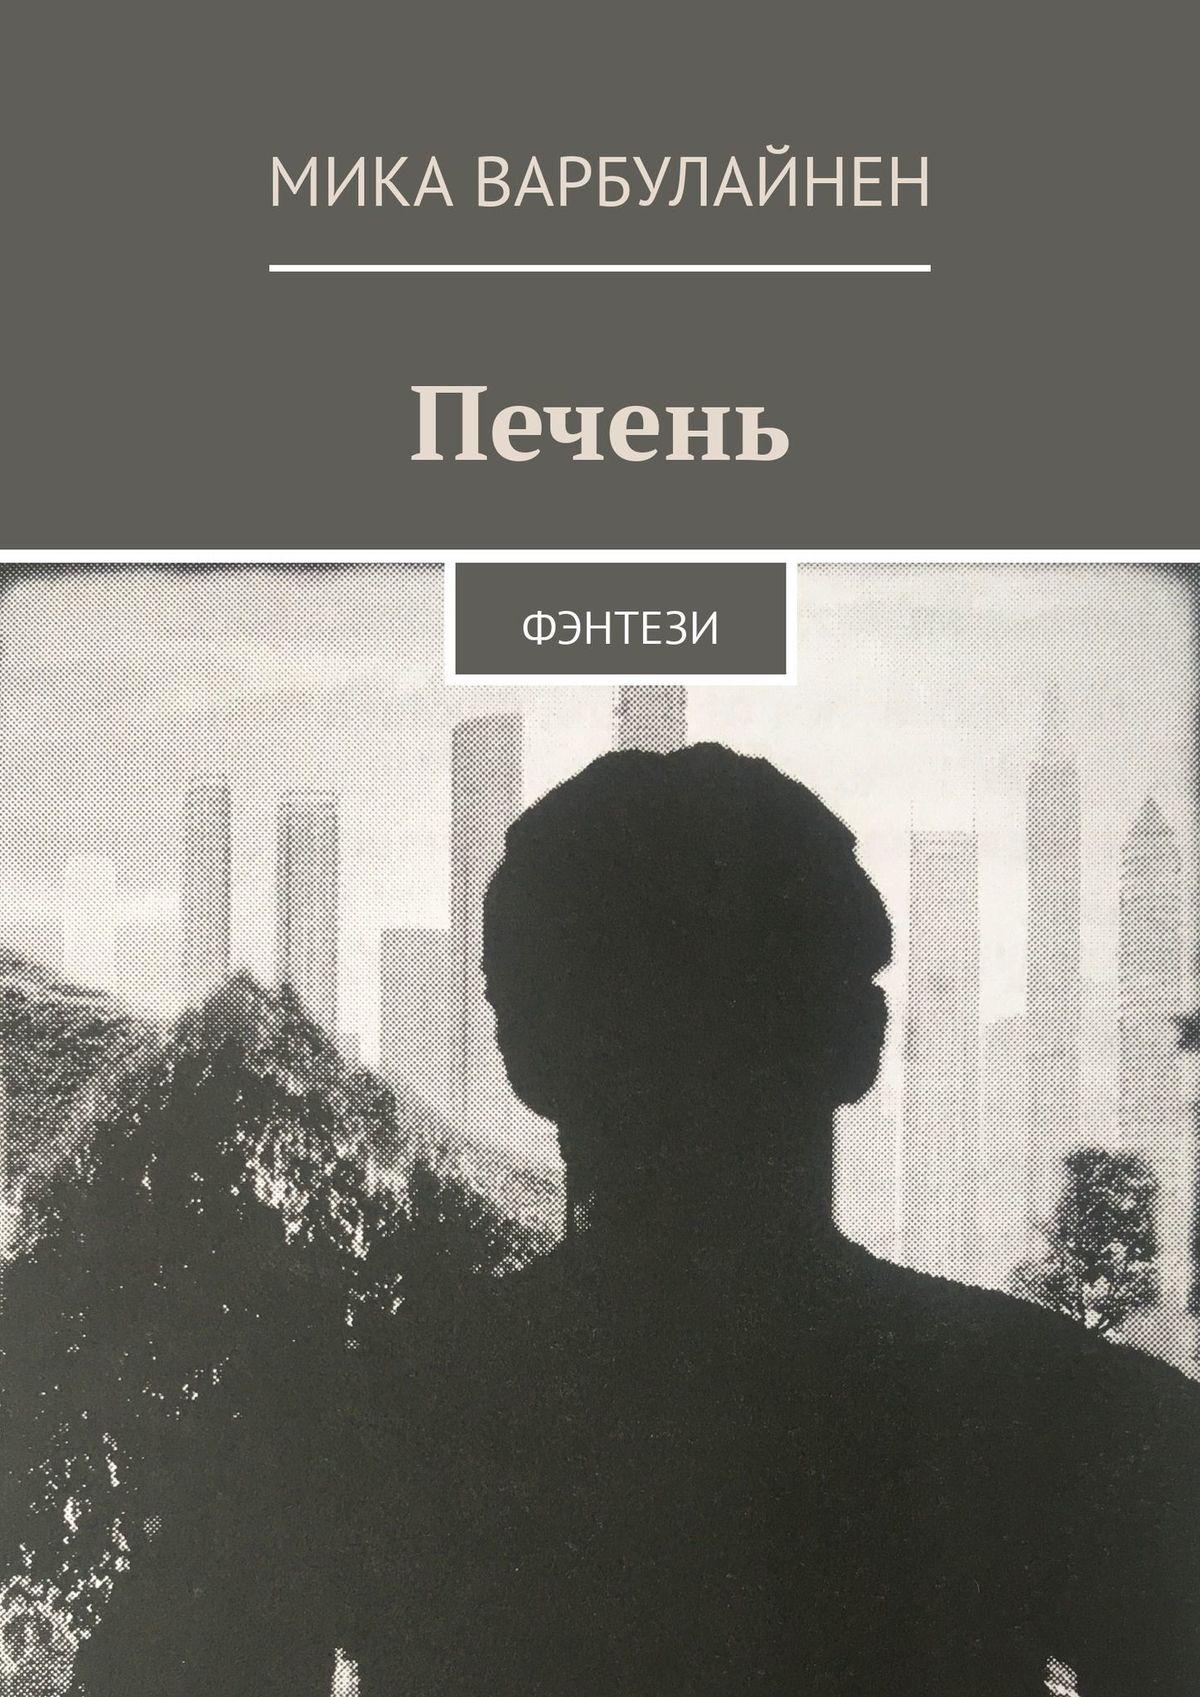 Купить книгу Печень. Фэнтези, автора Мики Варбулайнен